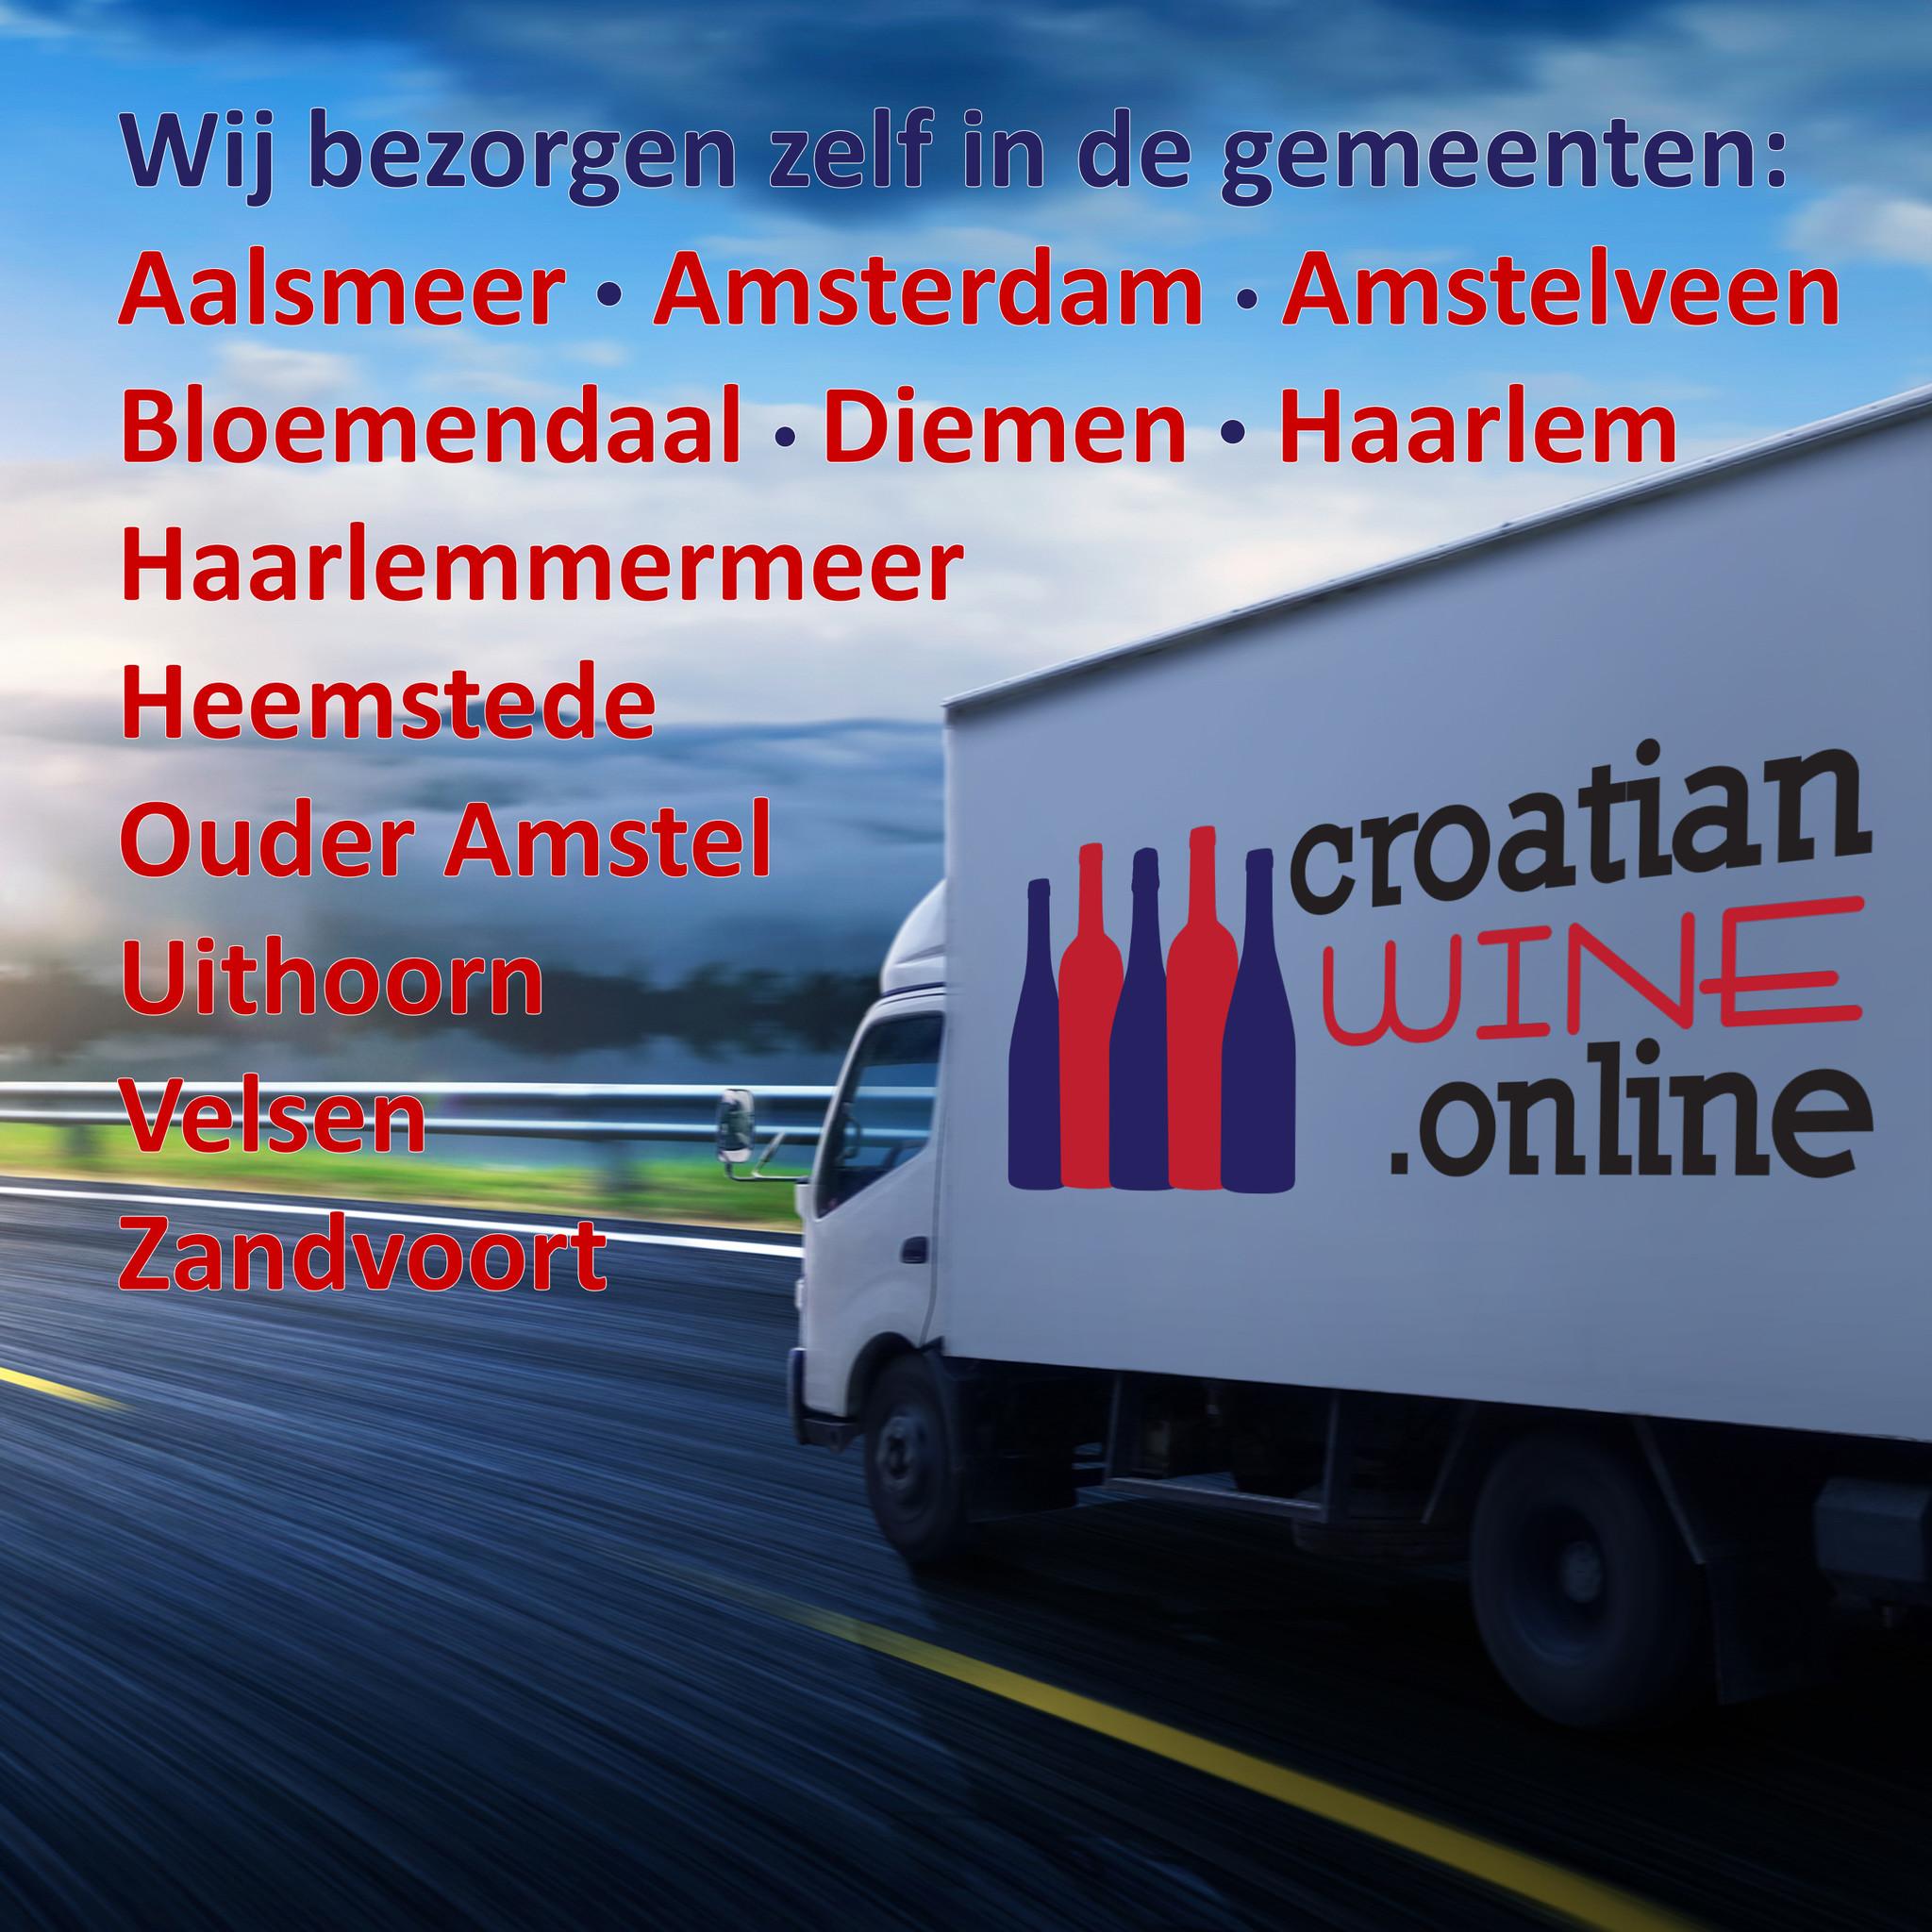 Croatianwine.online truck